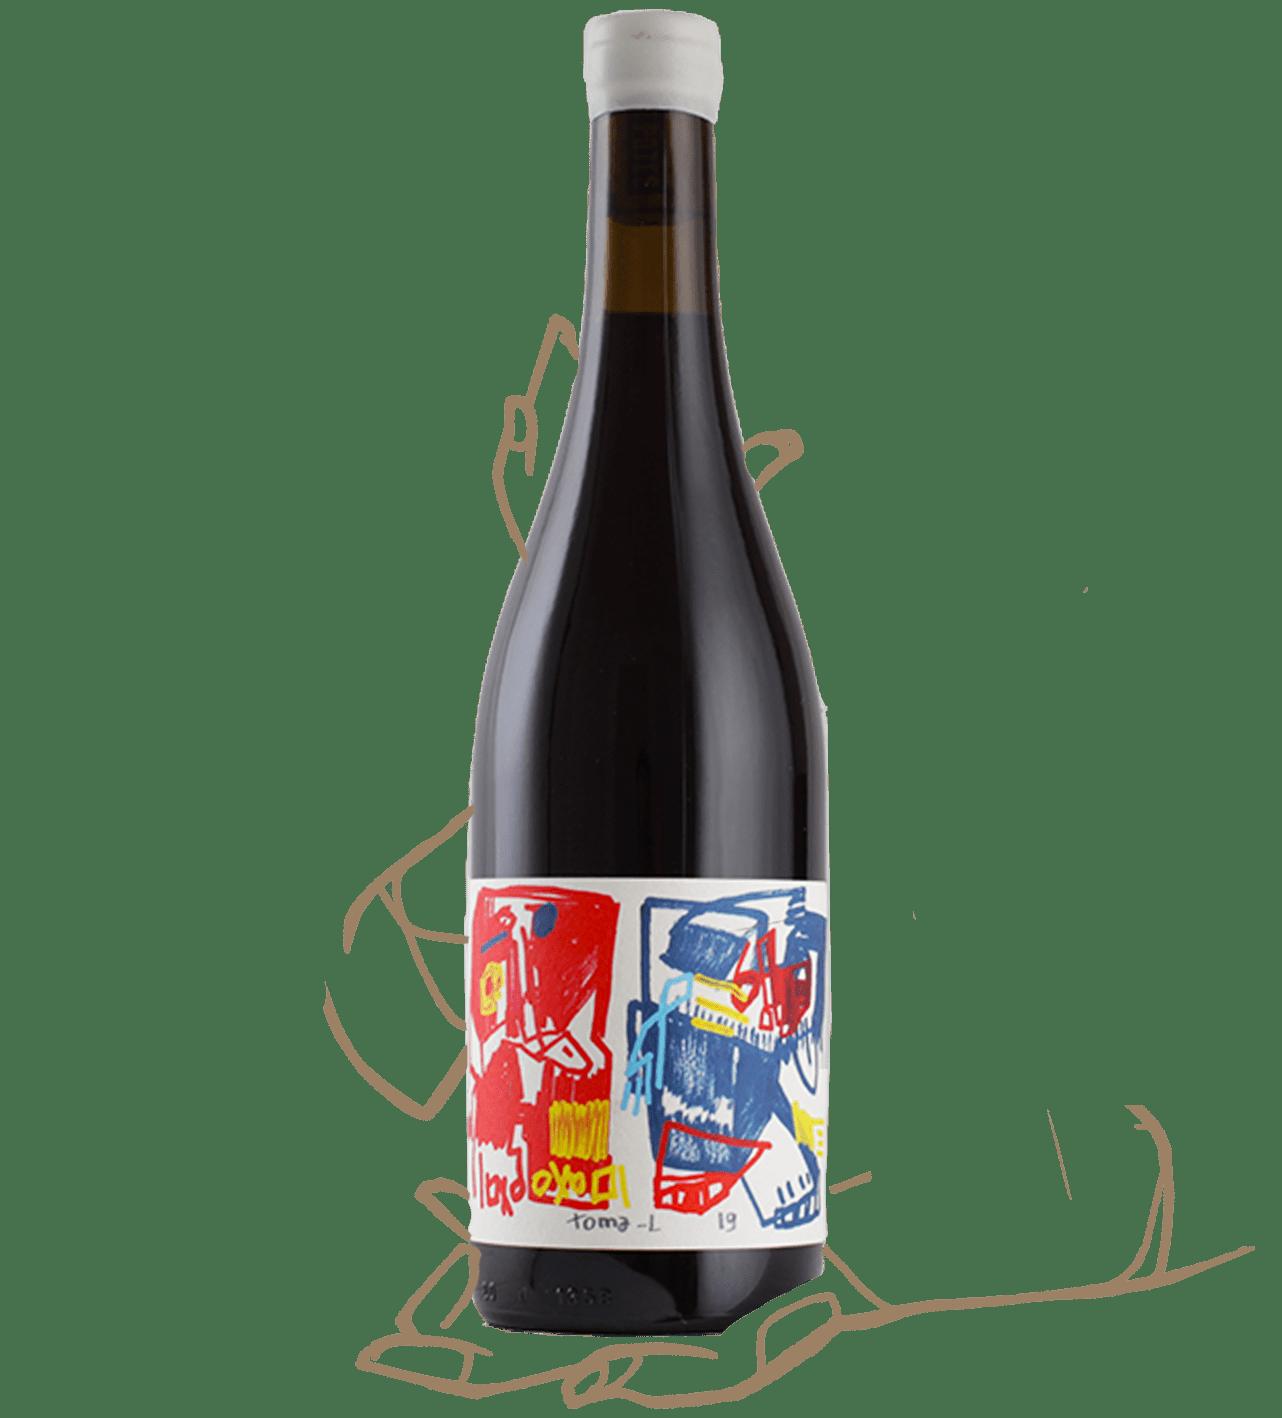 Historia de vi est un vin naturel catalan du vin des potes x Tuets